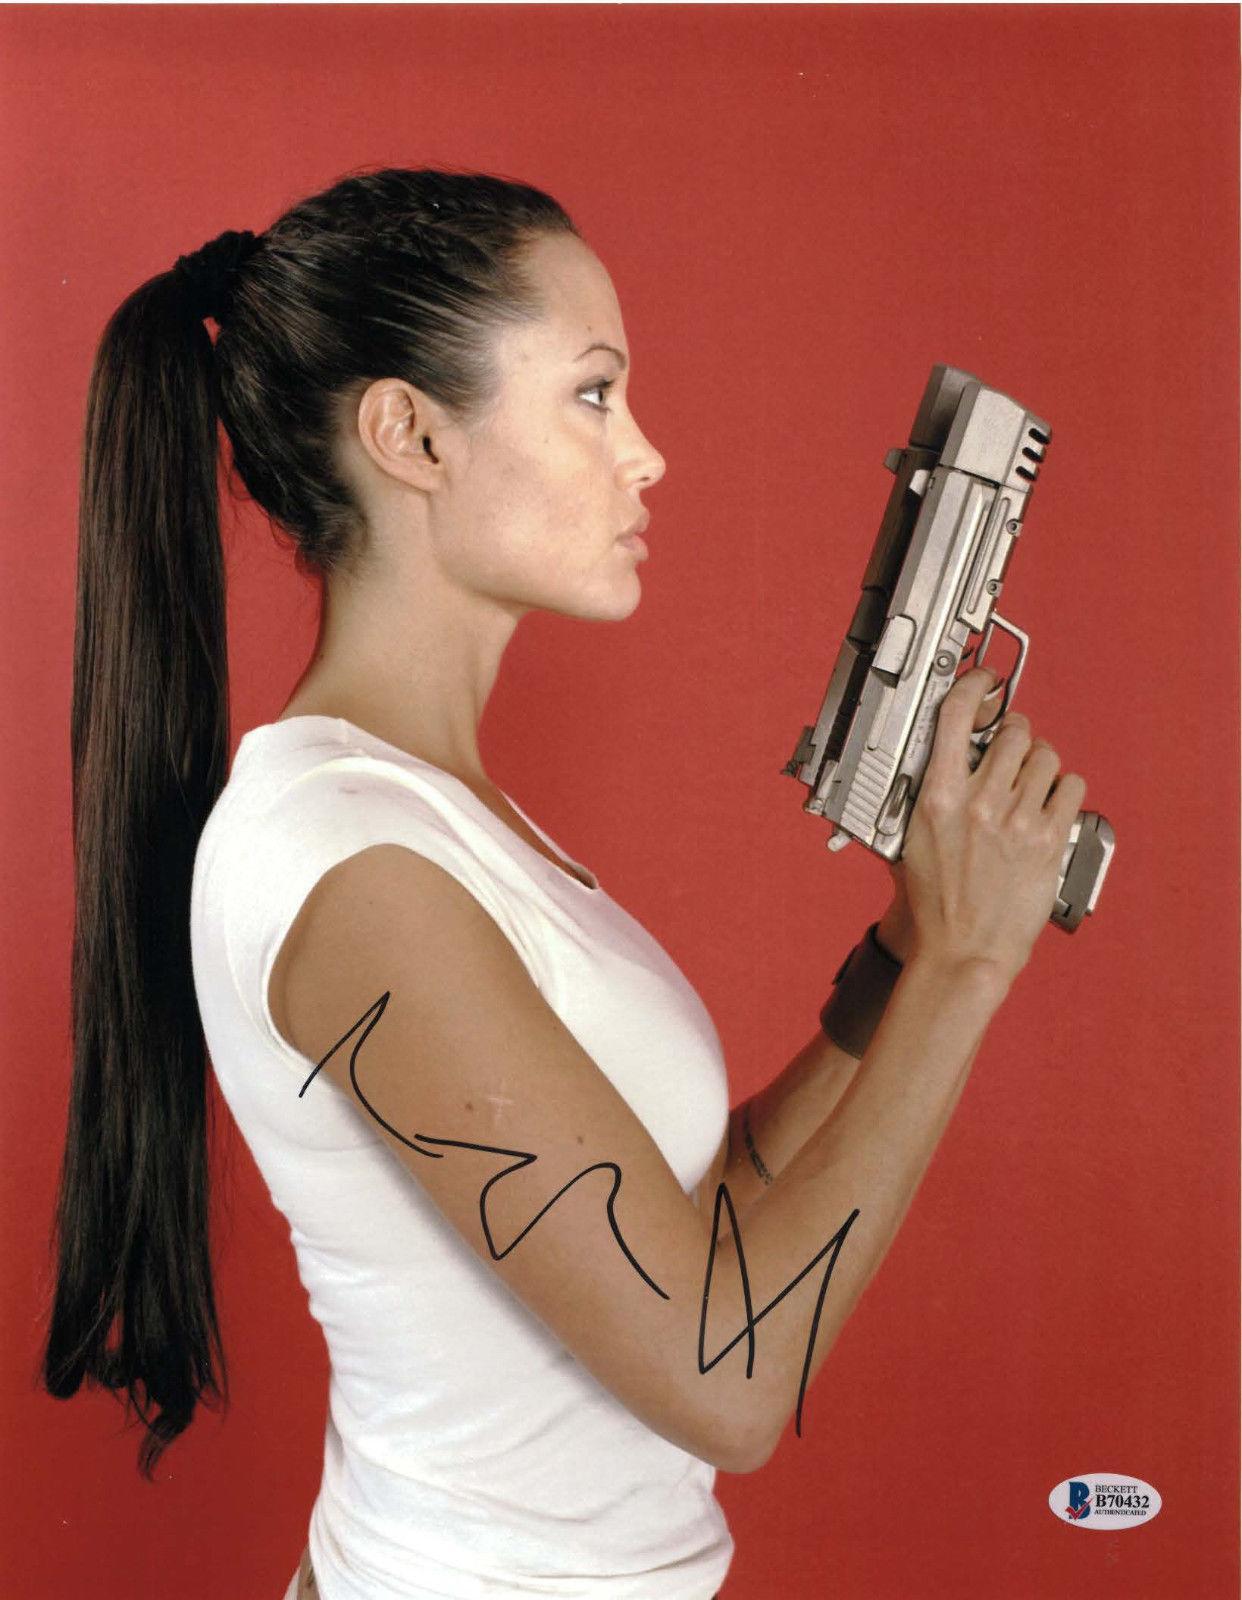 Halloween Party ☝️ Lara Croft (Angelina Jolie) in Tomb